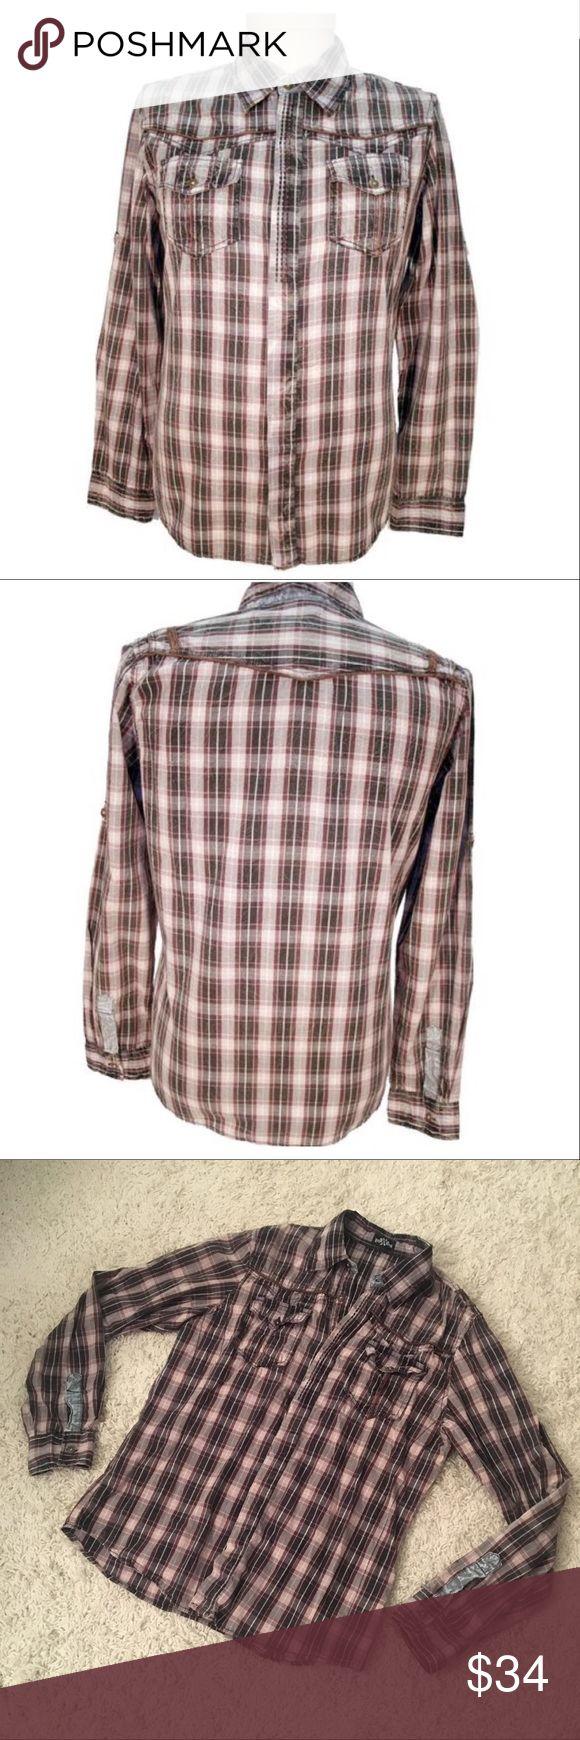 "X-RAY MEN'S Plaid shirt X-RAY MEN'S plaid Tritis button down shirt in charcoal | 100% cotton | size M | inseam is 15"" x-ray Shirts Casual Button Down Shirts"